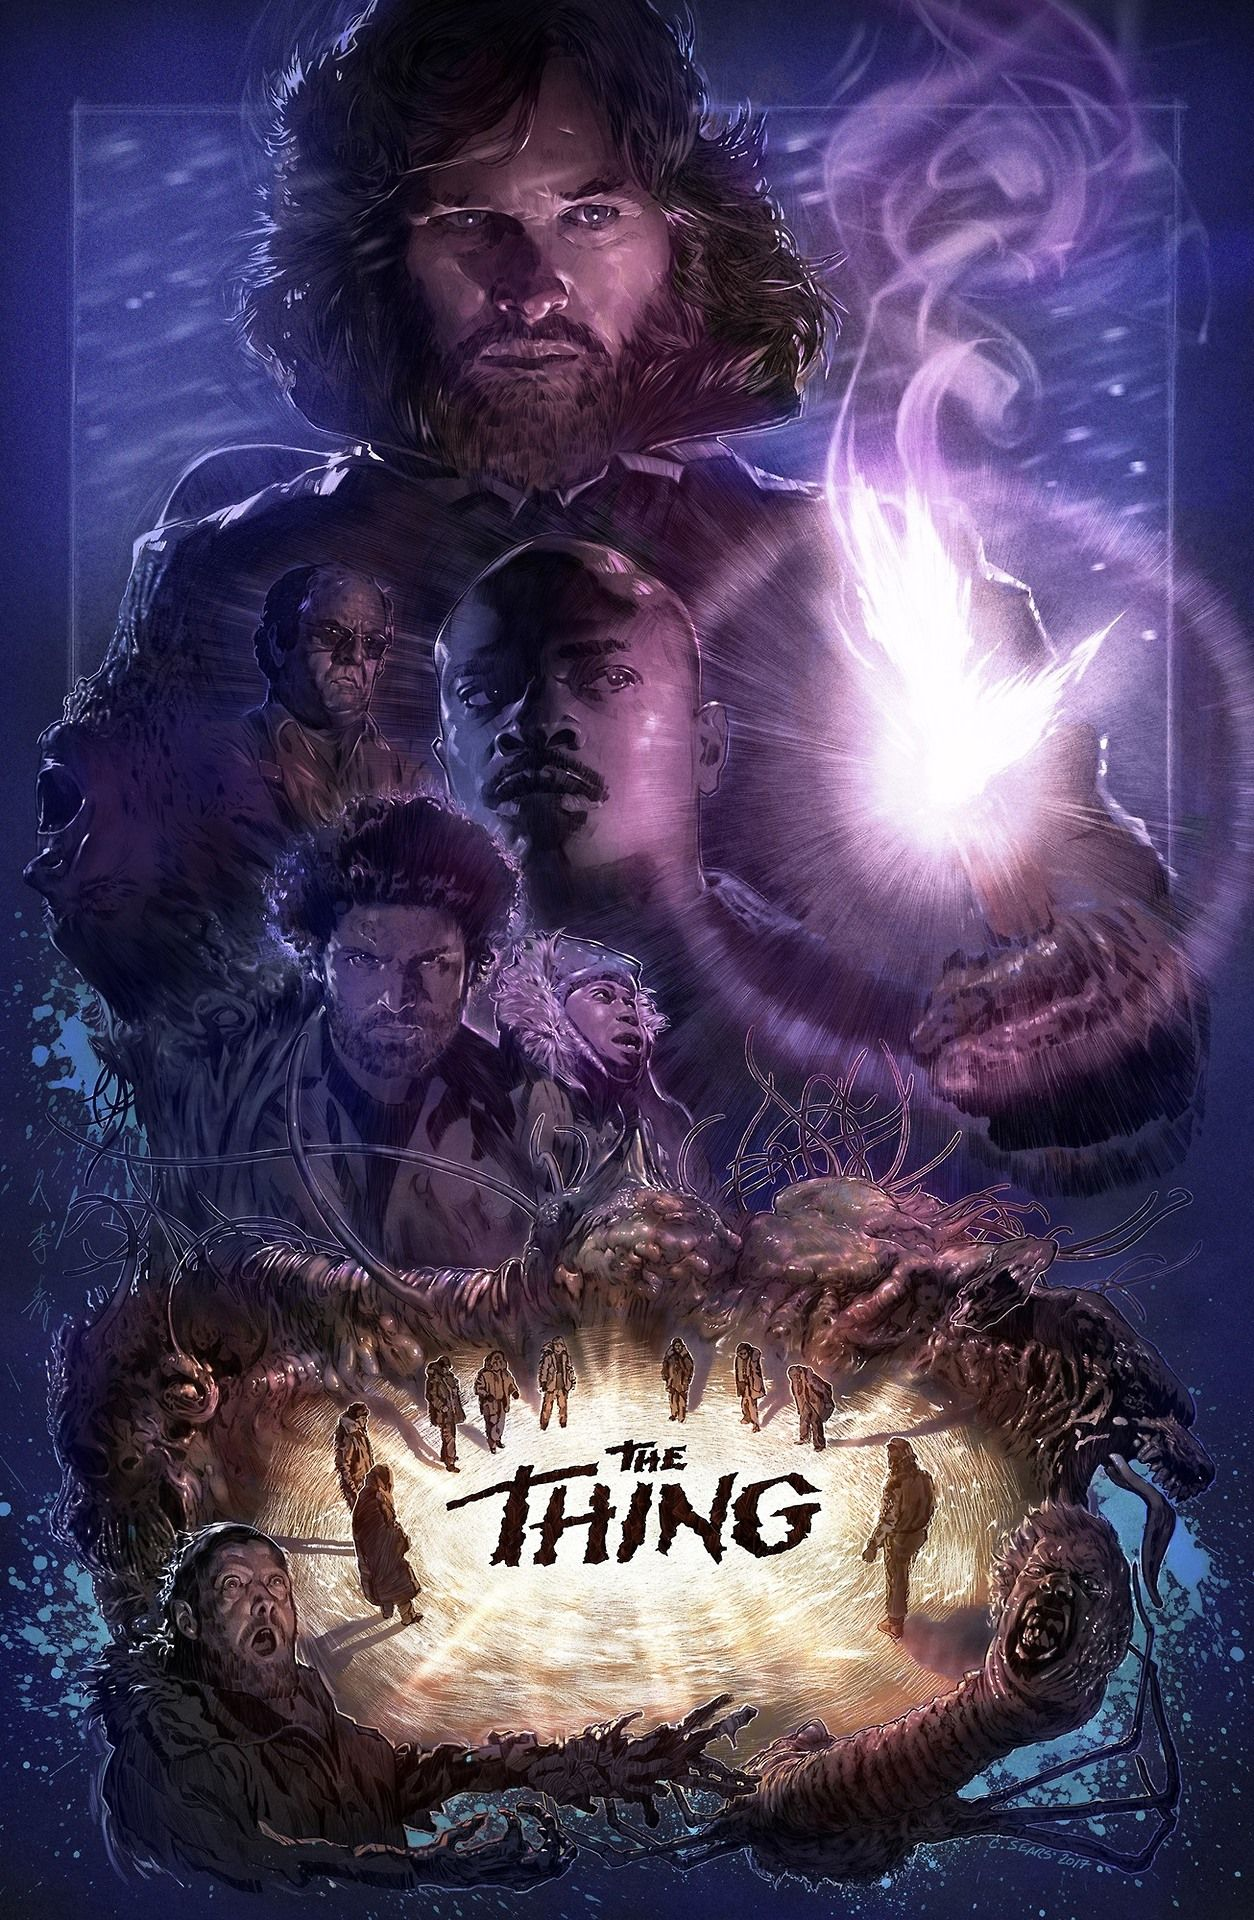 horror movie art movie poster art